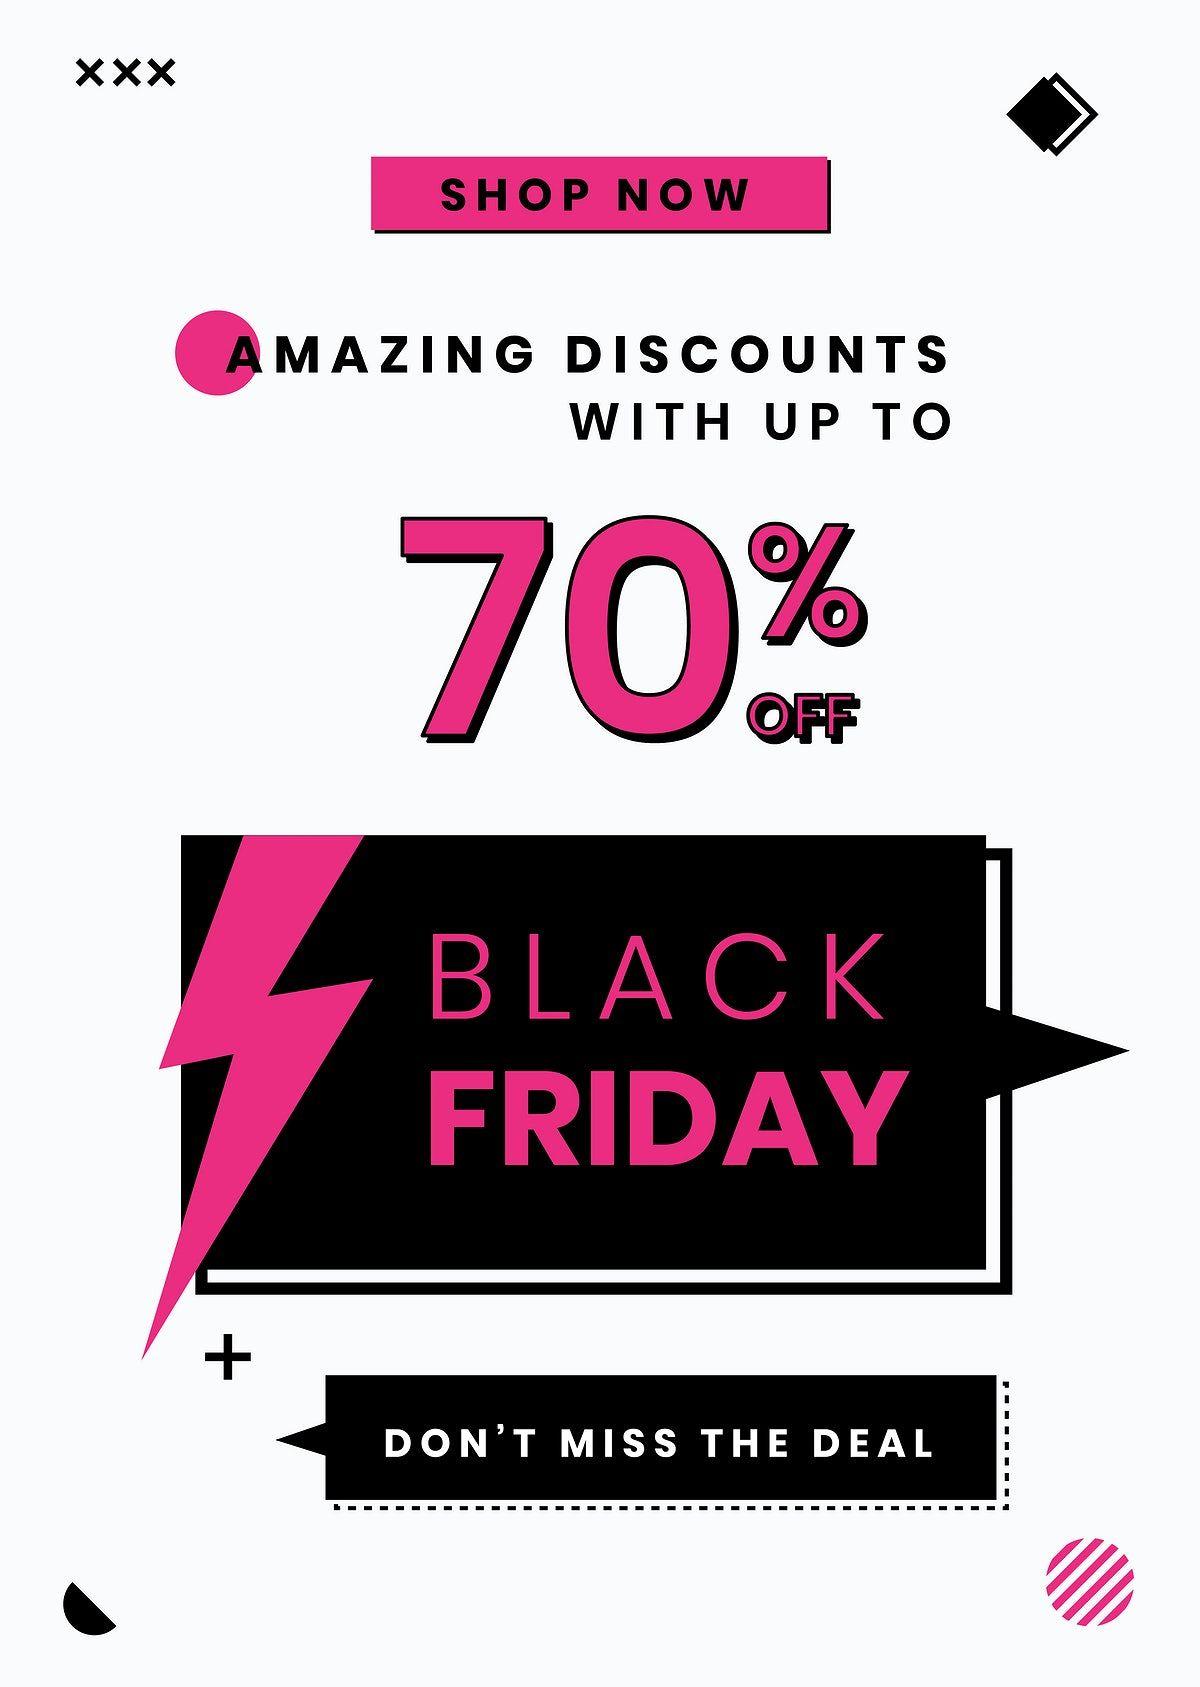 Download Premium Vector Of Black Friday Vector 70 Off Pink Sale Promotion Black Friday Pink Sale Sale Promotion